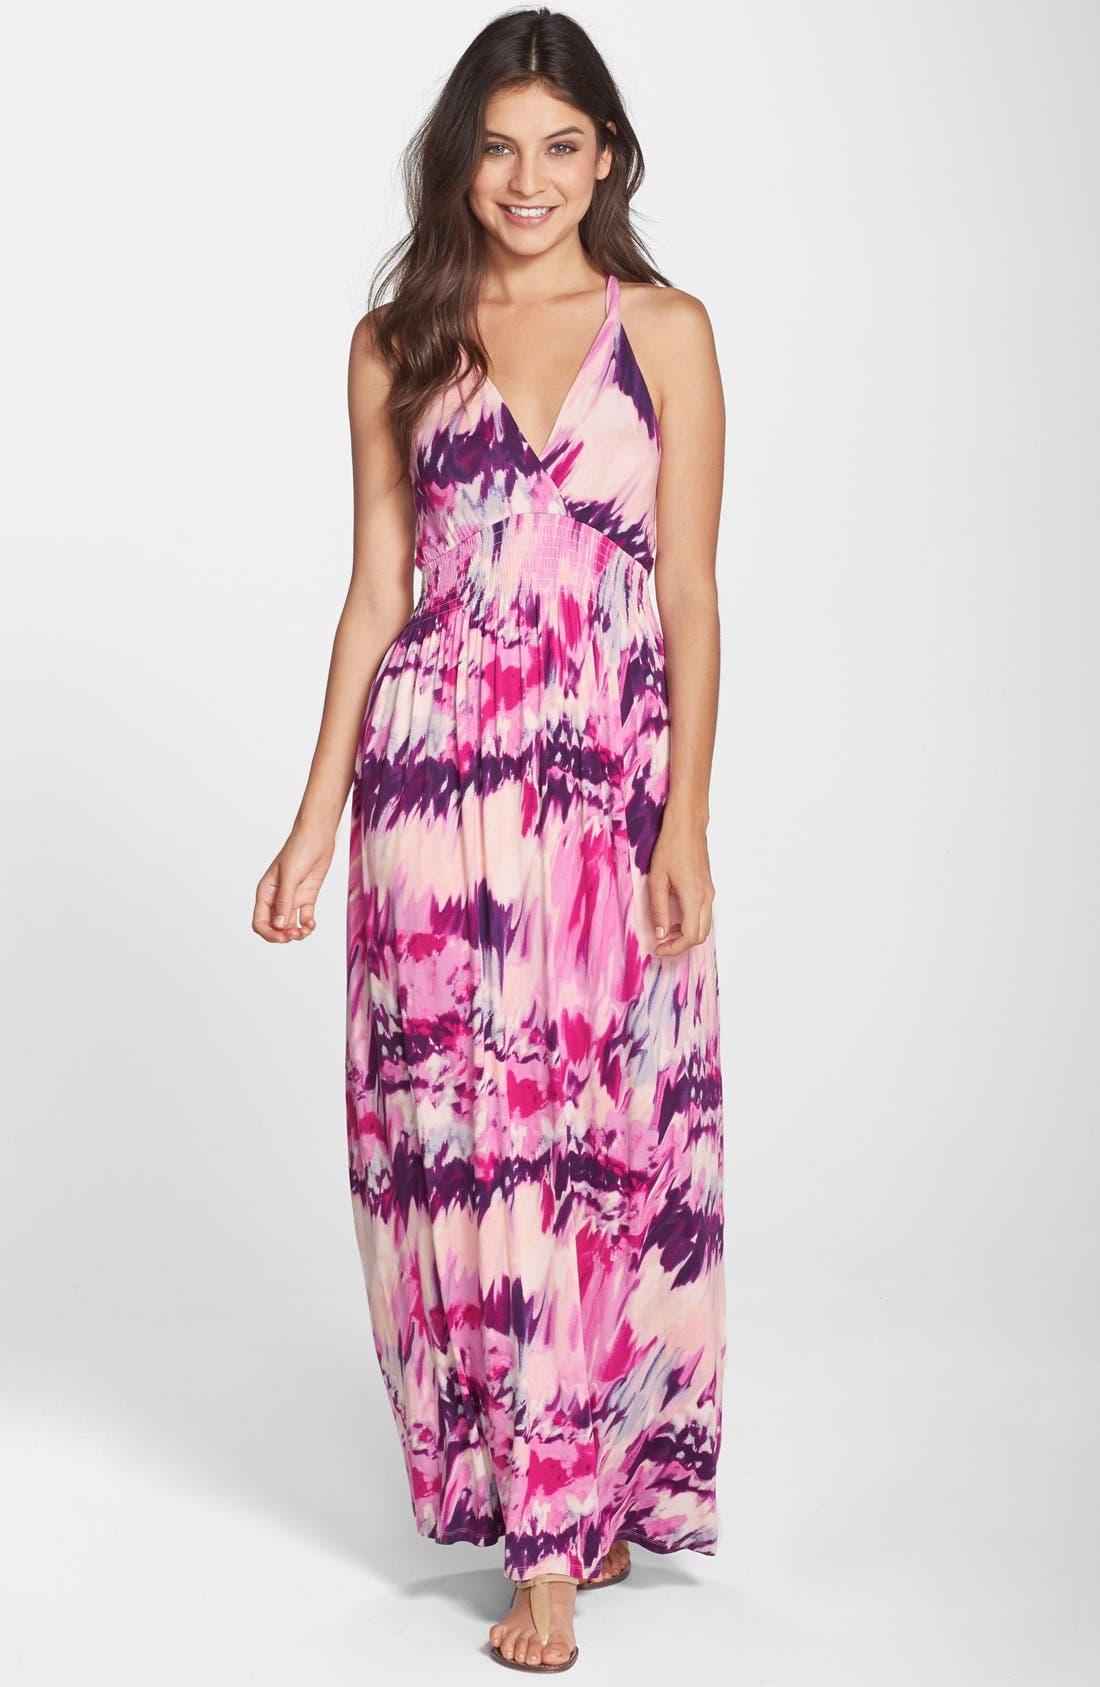 Alternate Image 1 Selected - Felicity & Coco 'Nina' Print Jersey Maxi Dress (Regular & Petite) (Nordstrom Exclusive)